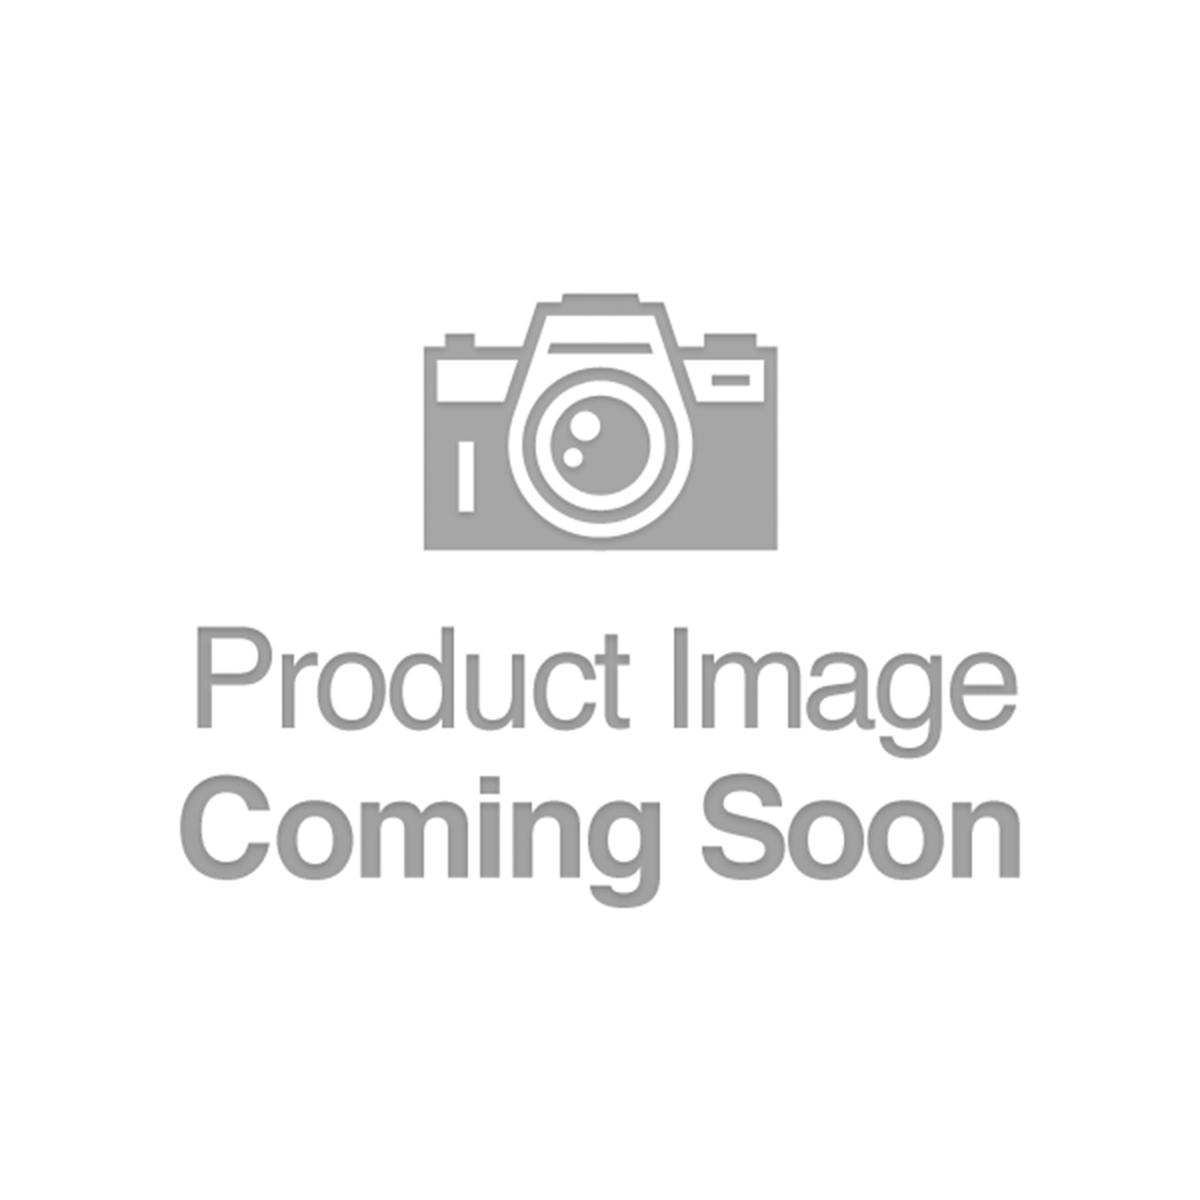 MPC Series 641 5C PCGS 66PPQ